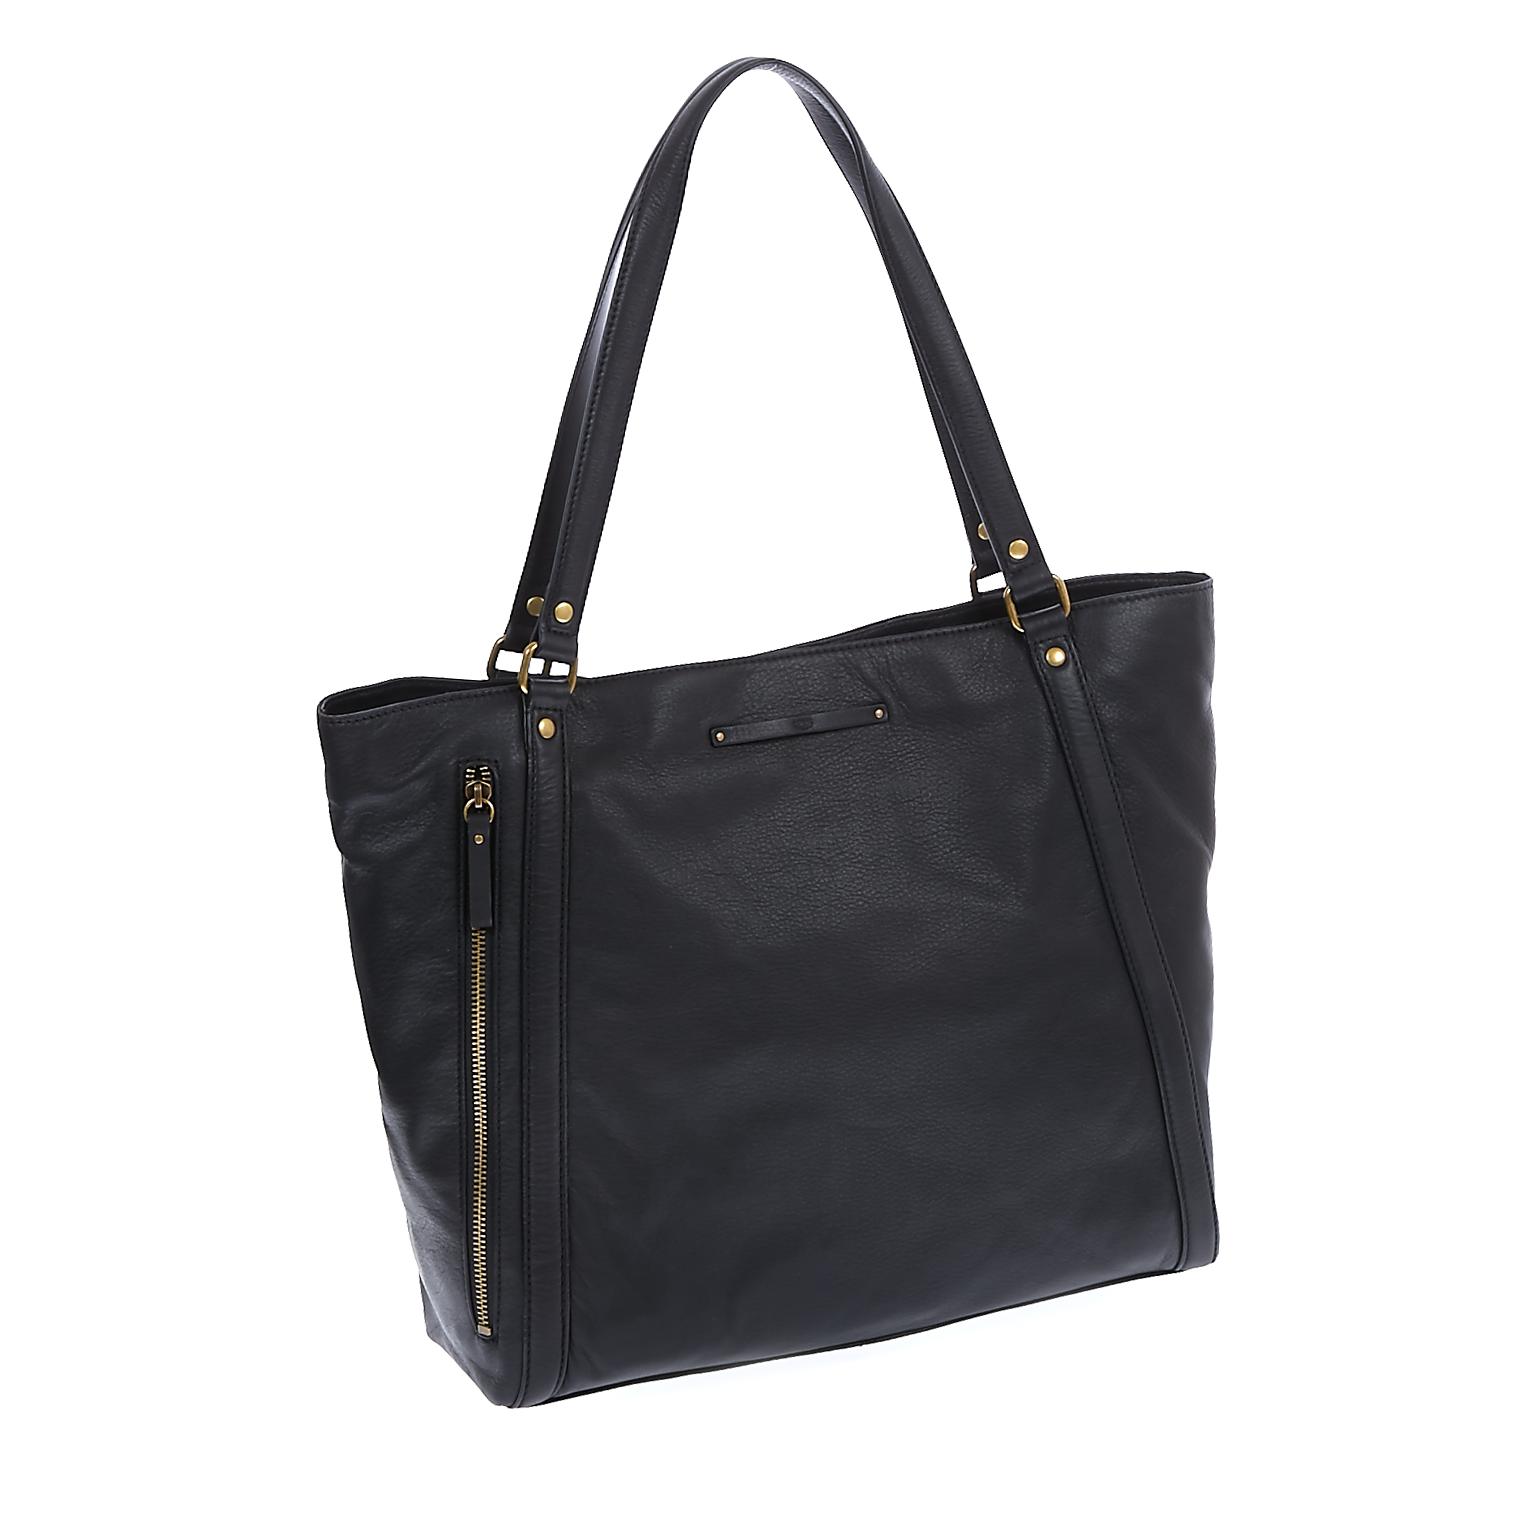 UGG AUSTRALIA – Γυναικεία τσάντα Ugg Australia μαύρη 1473726.0-0071